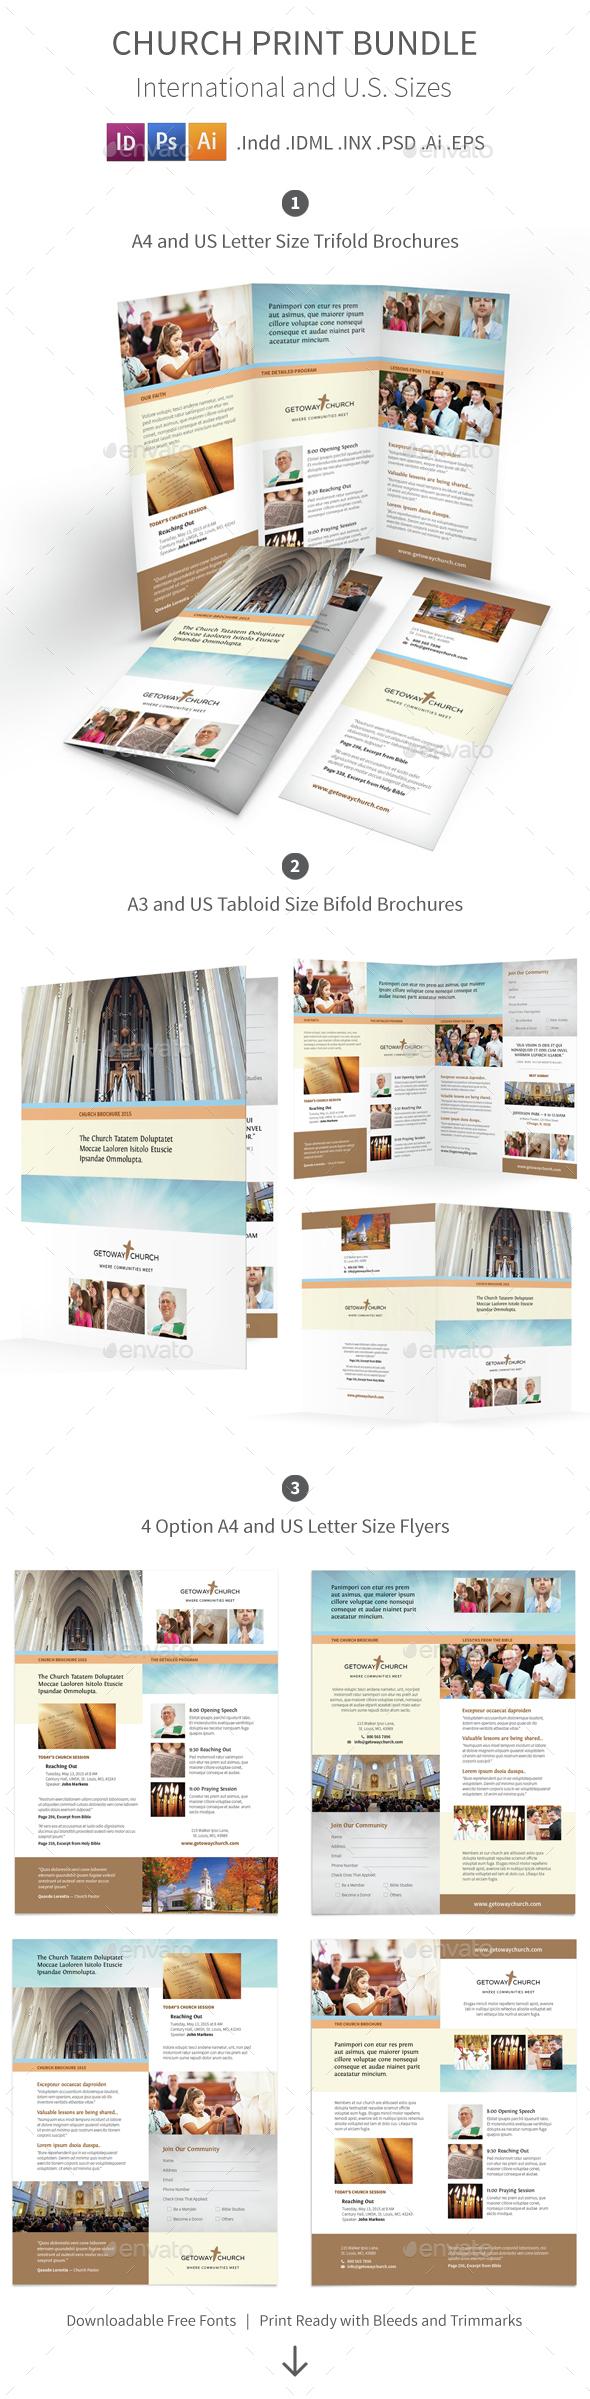 Church Print Bundle 2 - Informational Brochures